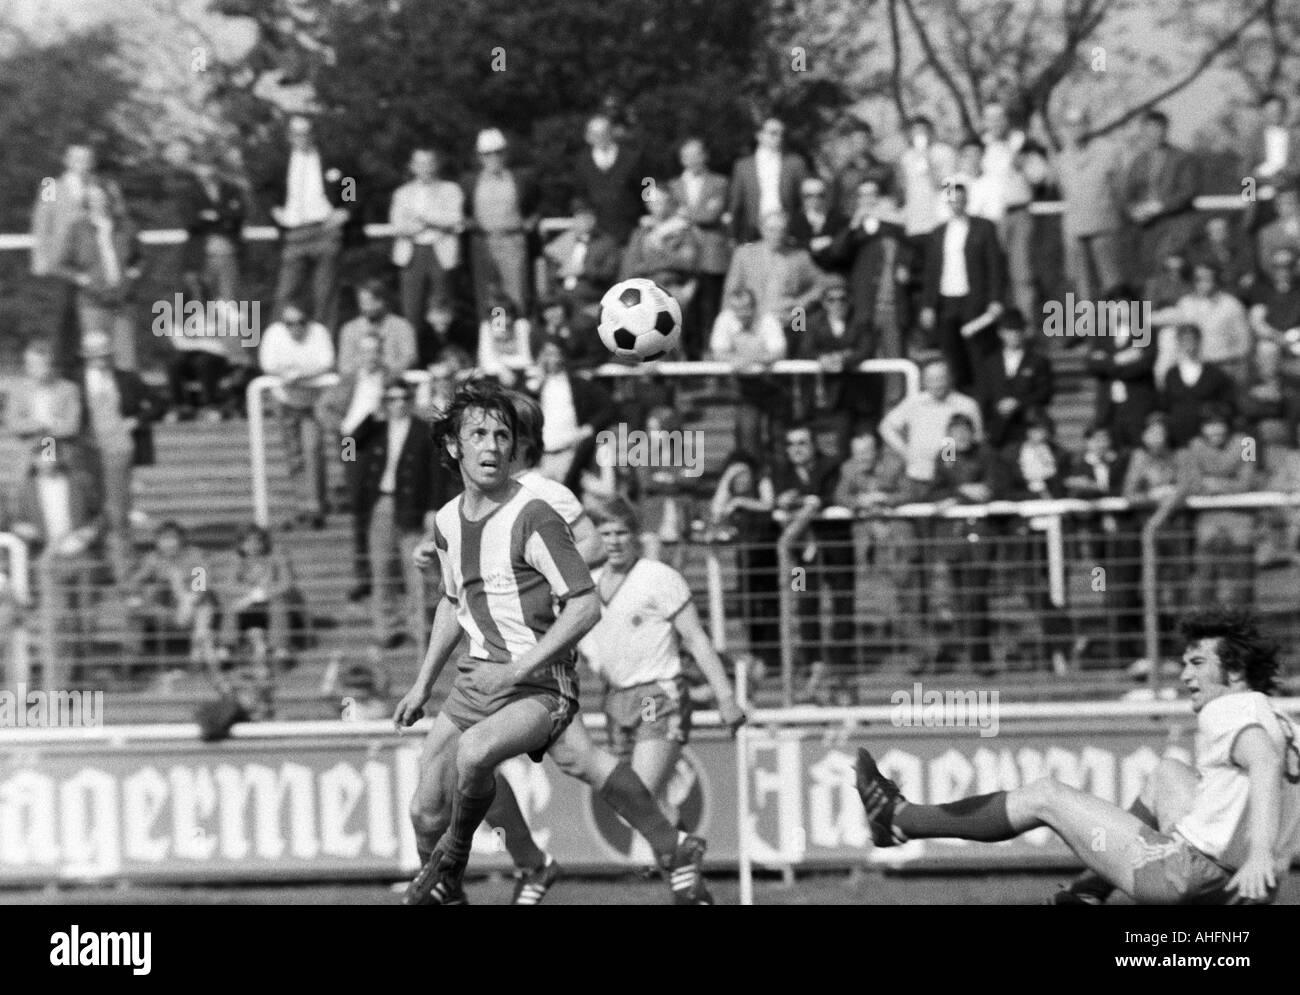 football, Bundesliga, 1971/1972, Rot-Weiss Oberhausen versus Hertha BSC Berlin 5:2, Niederrhein Stadium in Oberhausen, scene of the match, f.l.t.r. Wolfgang Gayer (Berlin), Hans Schumacher (RWO), Ludwig Denz (RWO) aground - Stock Image